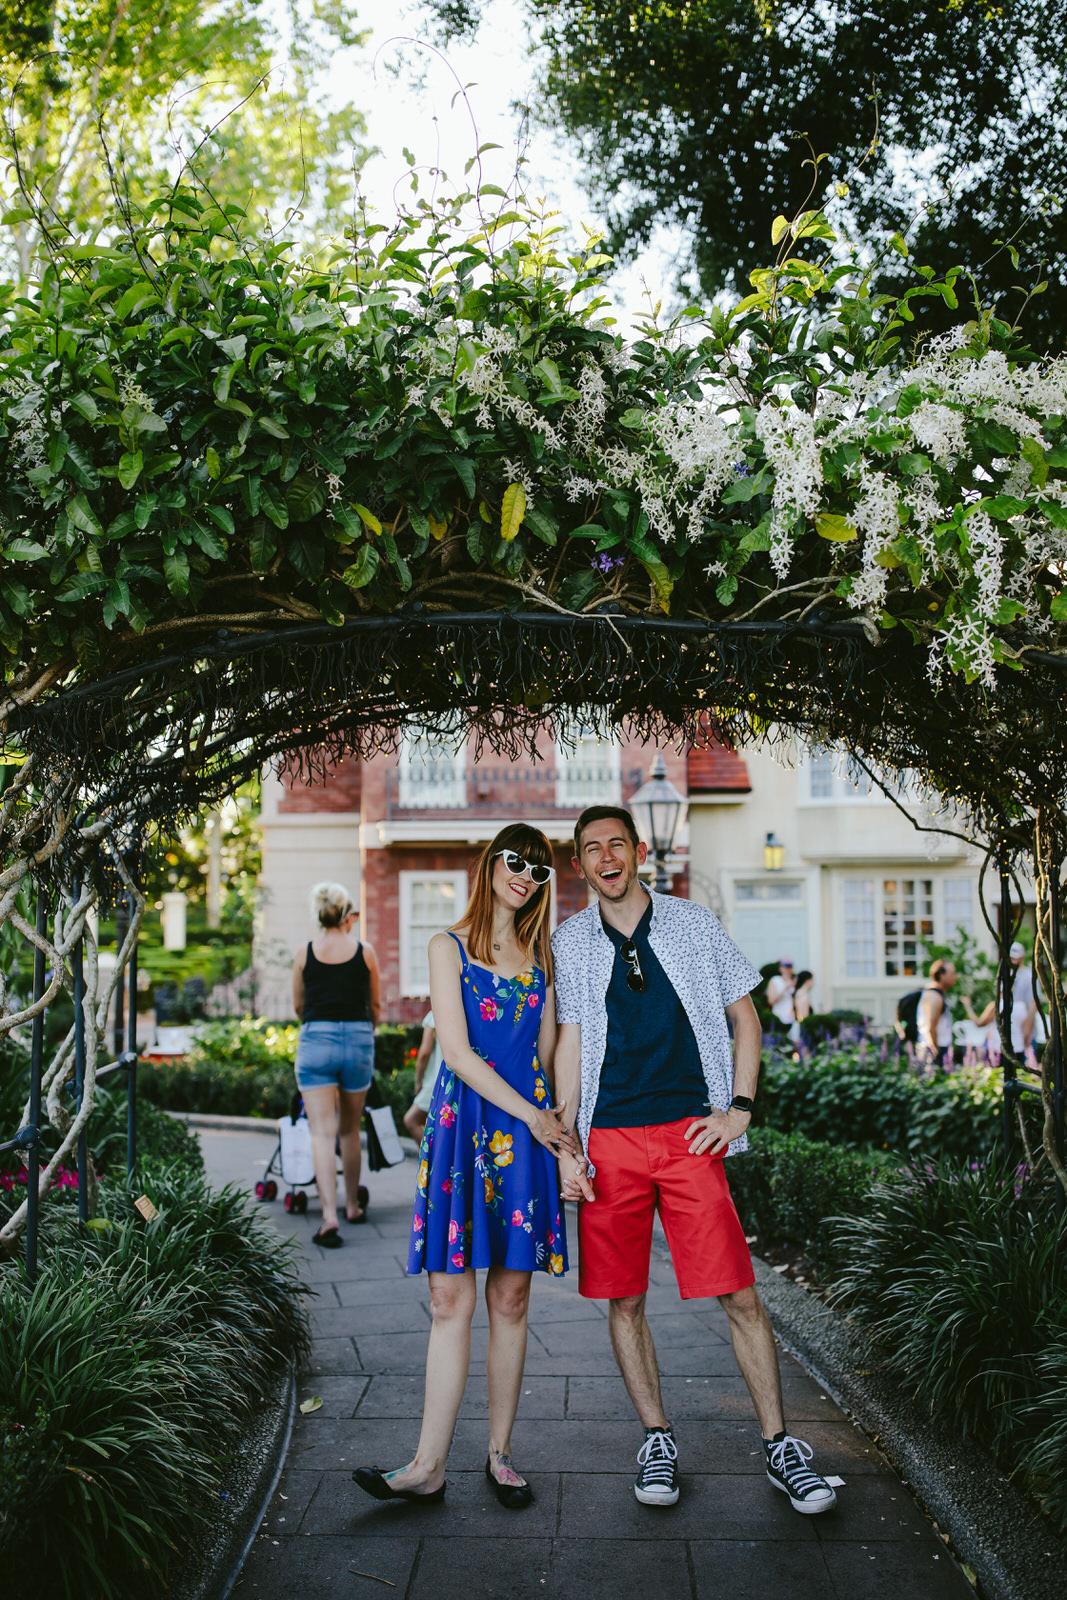 Adorable-Engagement-Session-Epcot-Orlando-Tiny-House-Photo-Wedding-Photographer-13.jpg